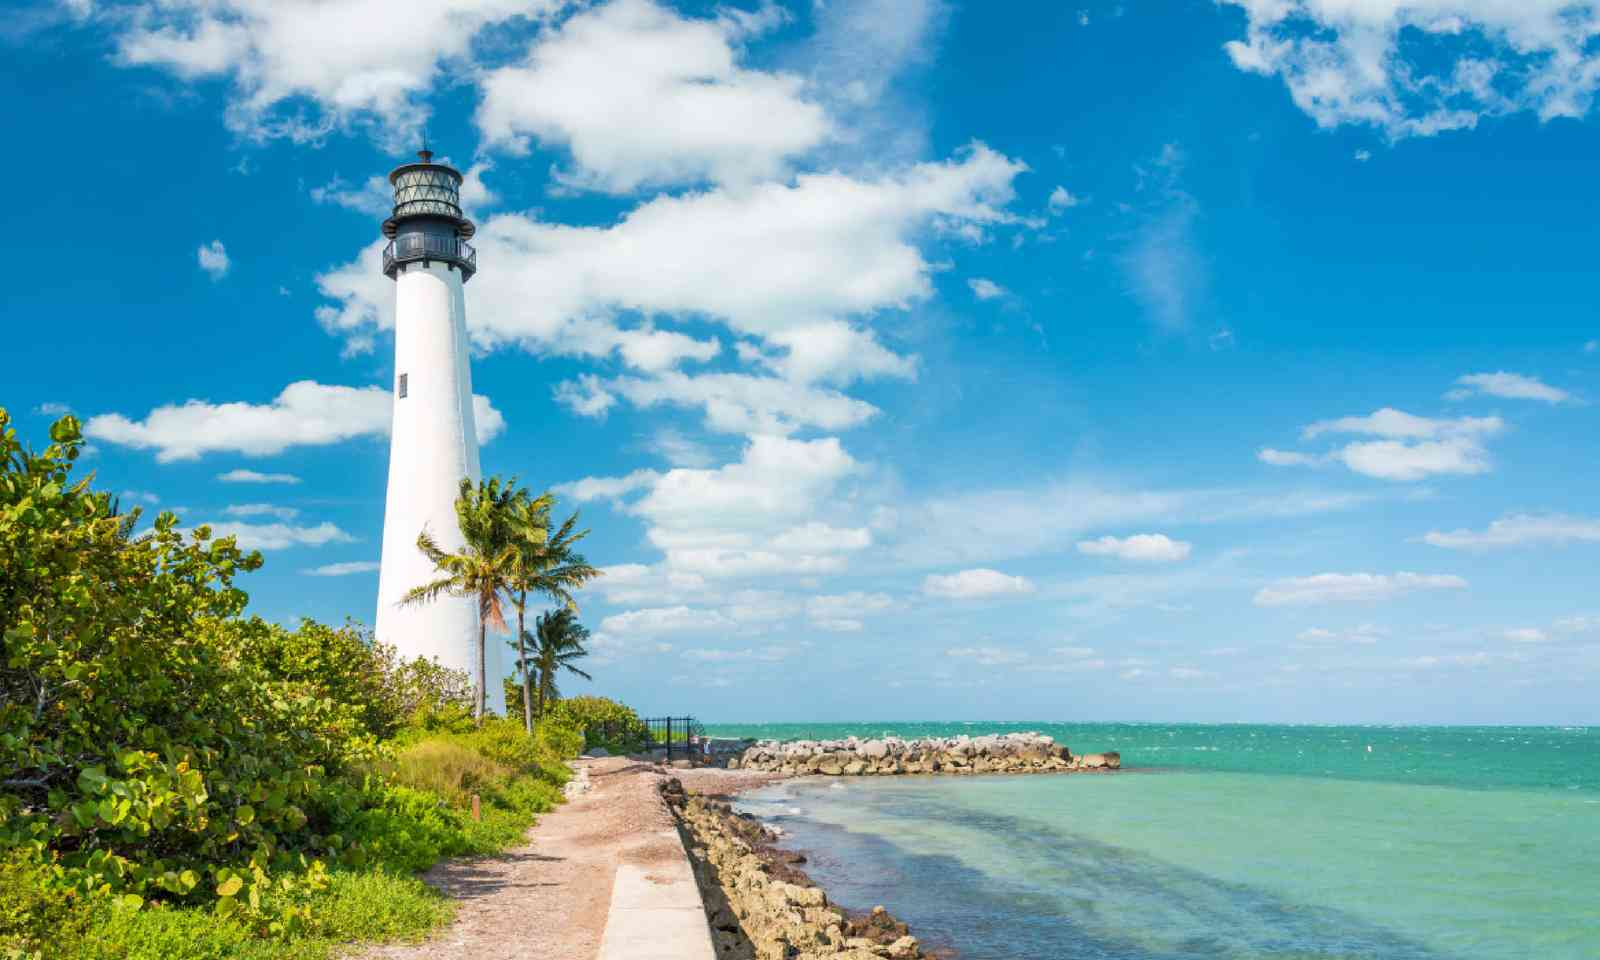 Key Biscayne (Shutterstock)